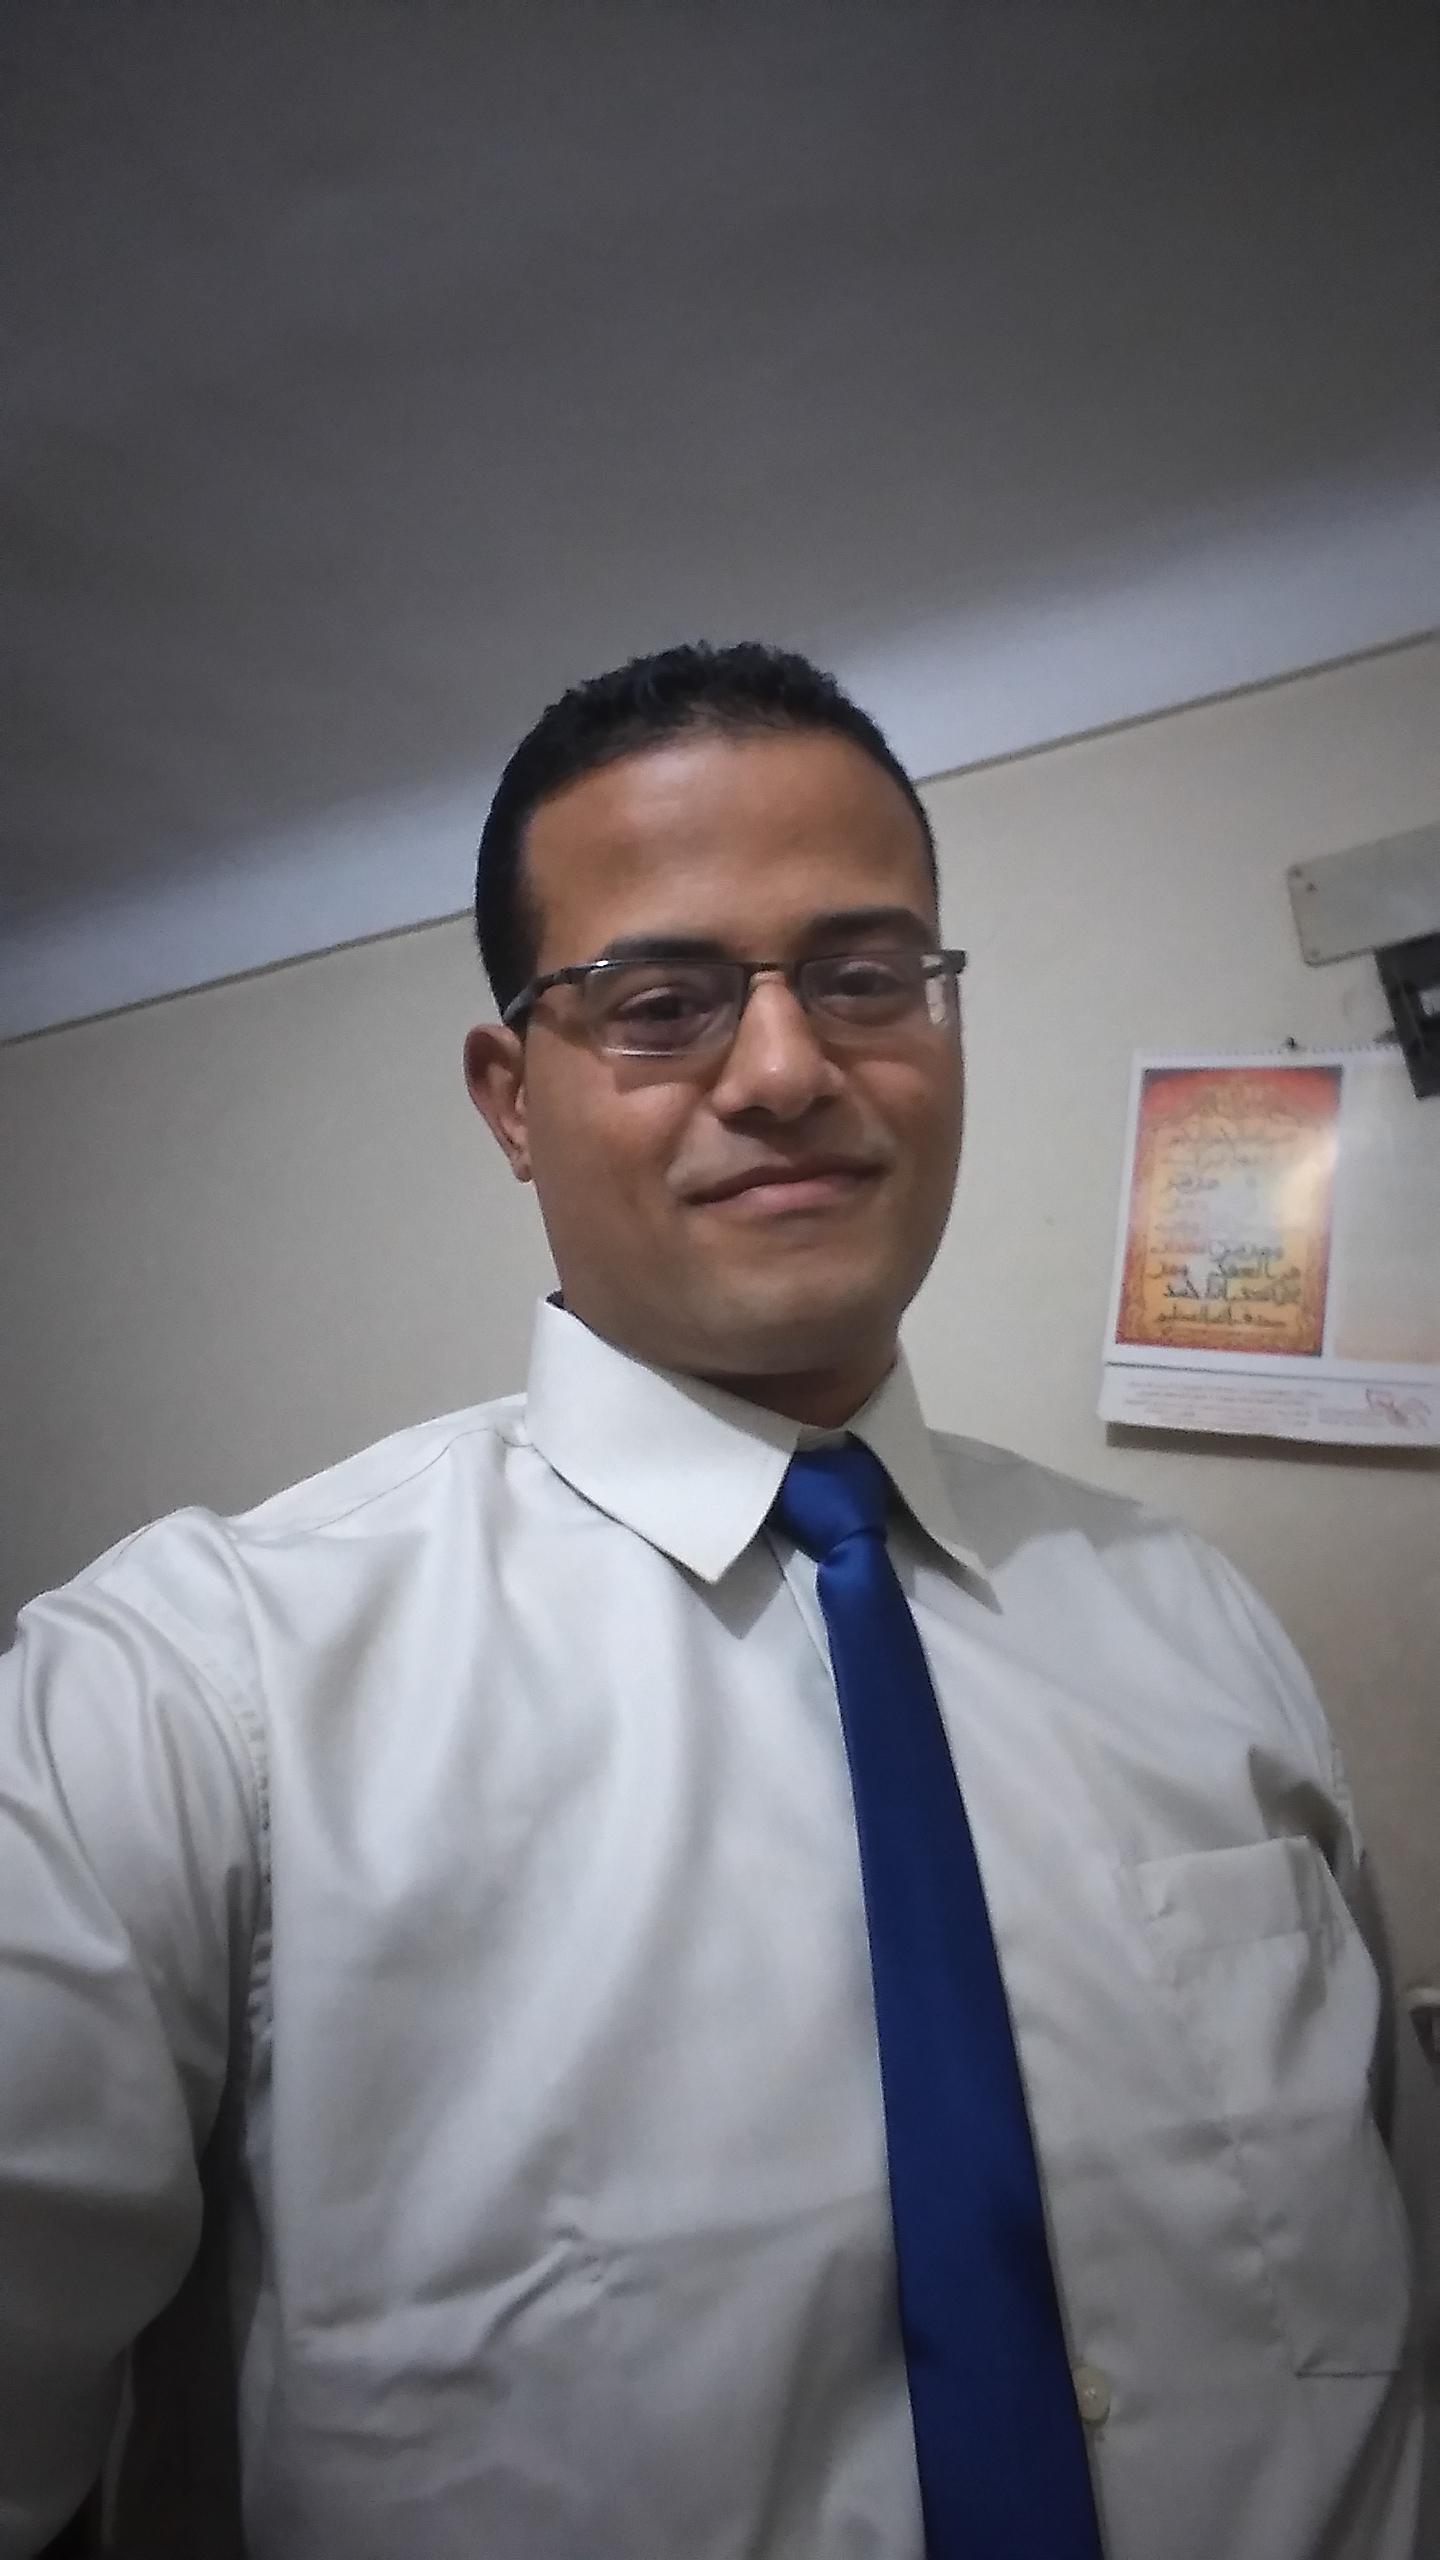 ahmedibrahim1 Profile Picture